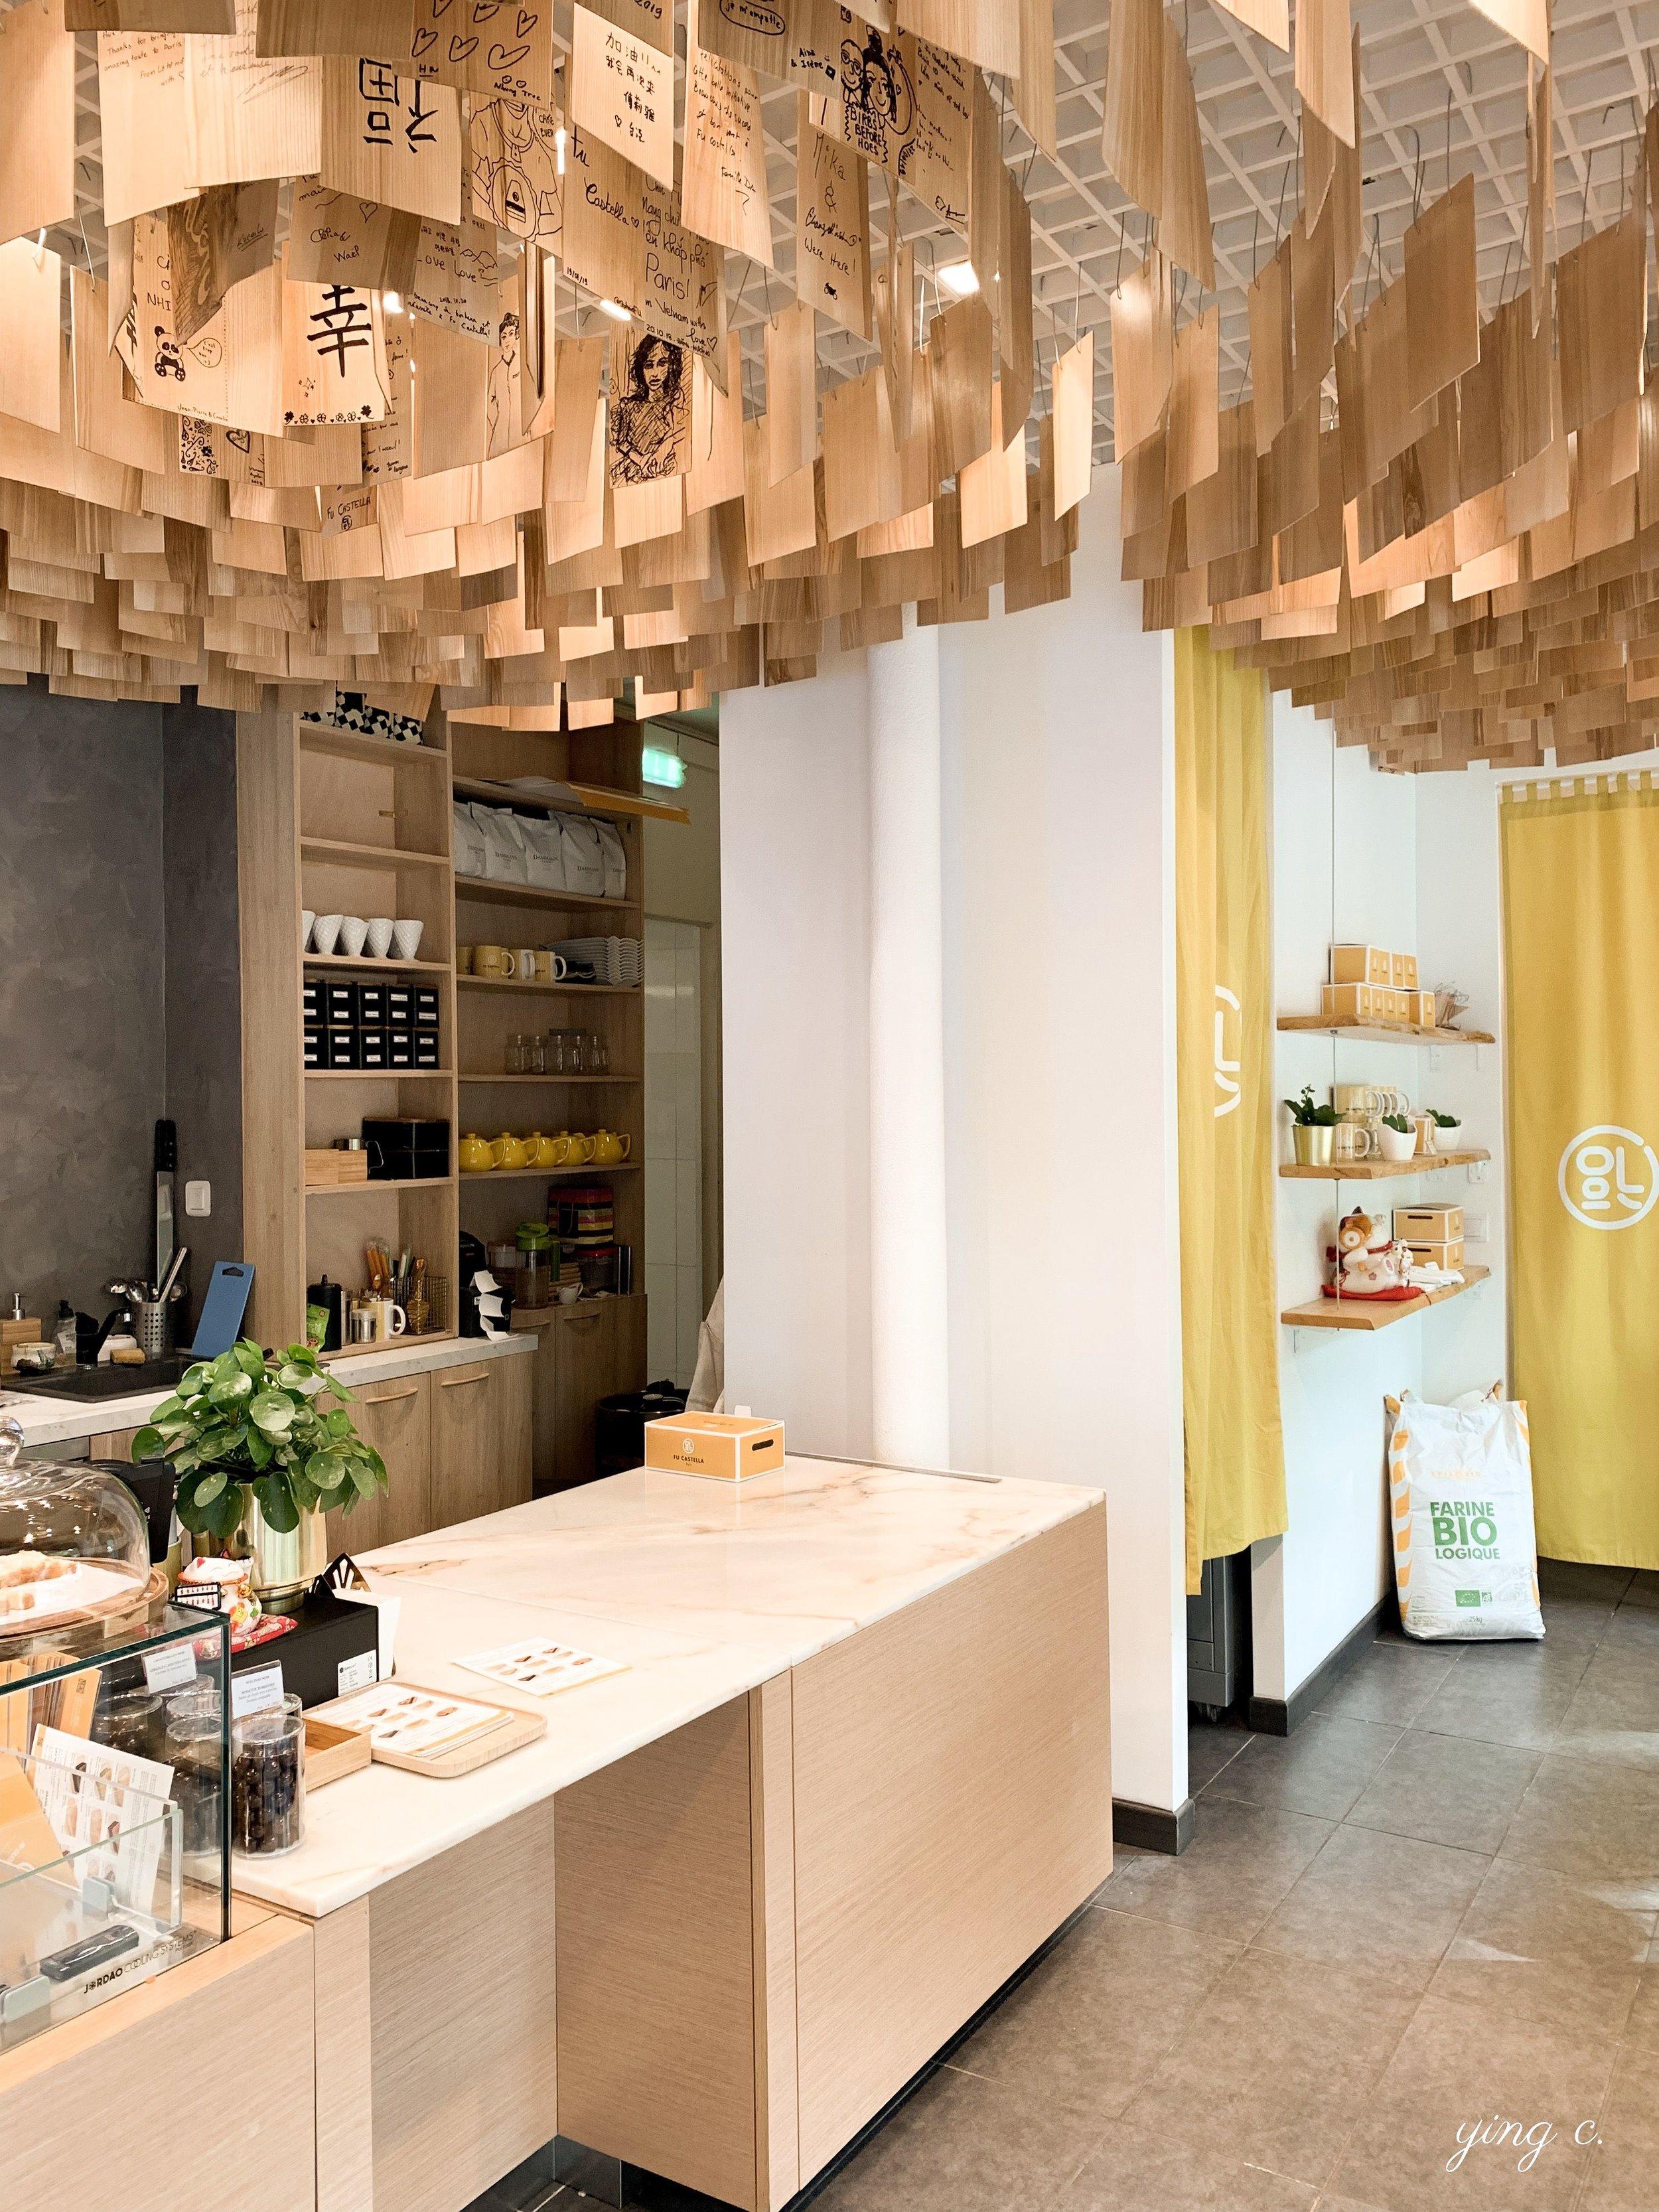 Fu Castella 以明亮的黃色為主體視覺、混合日式風格的店面。